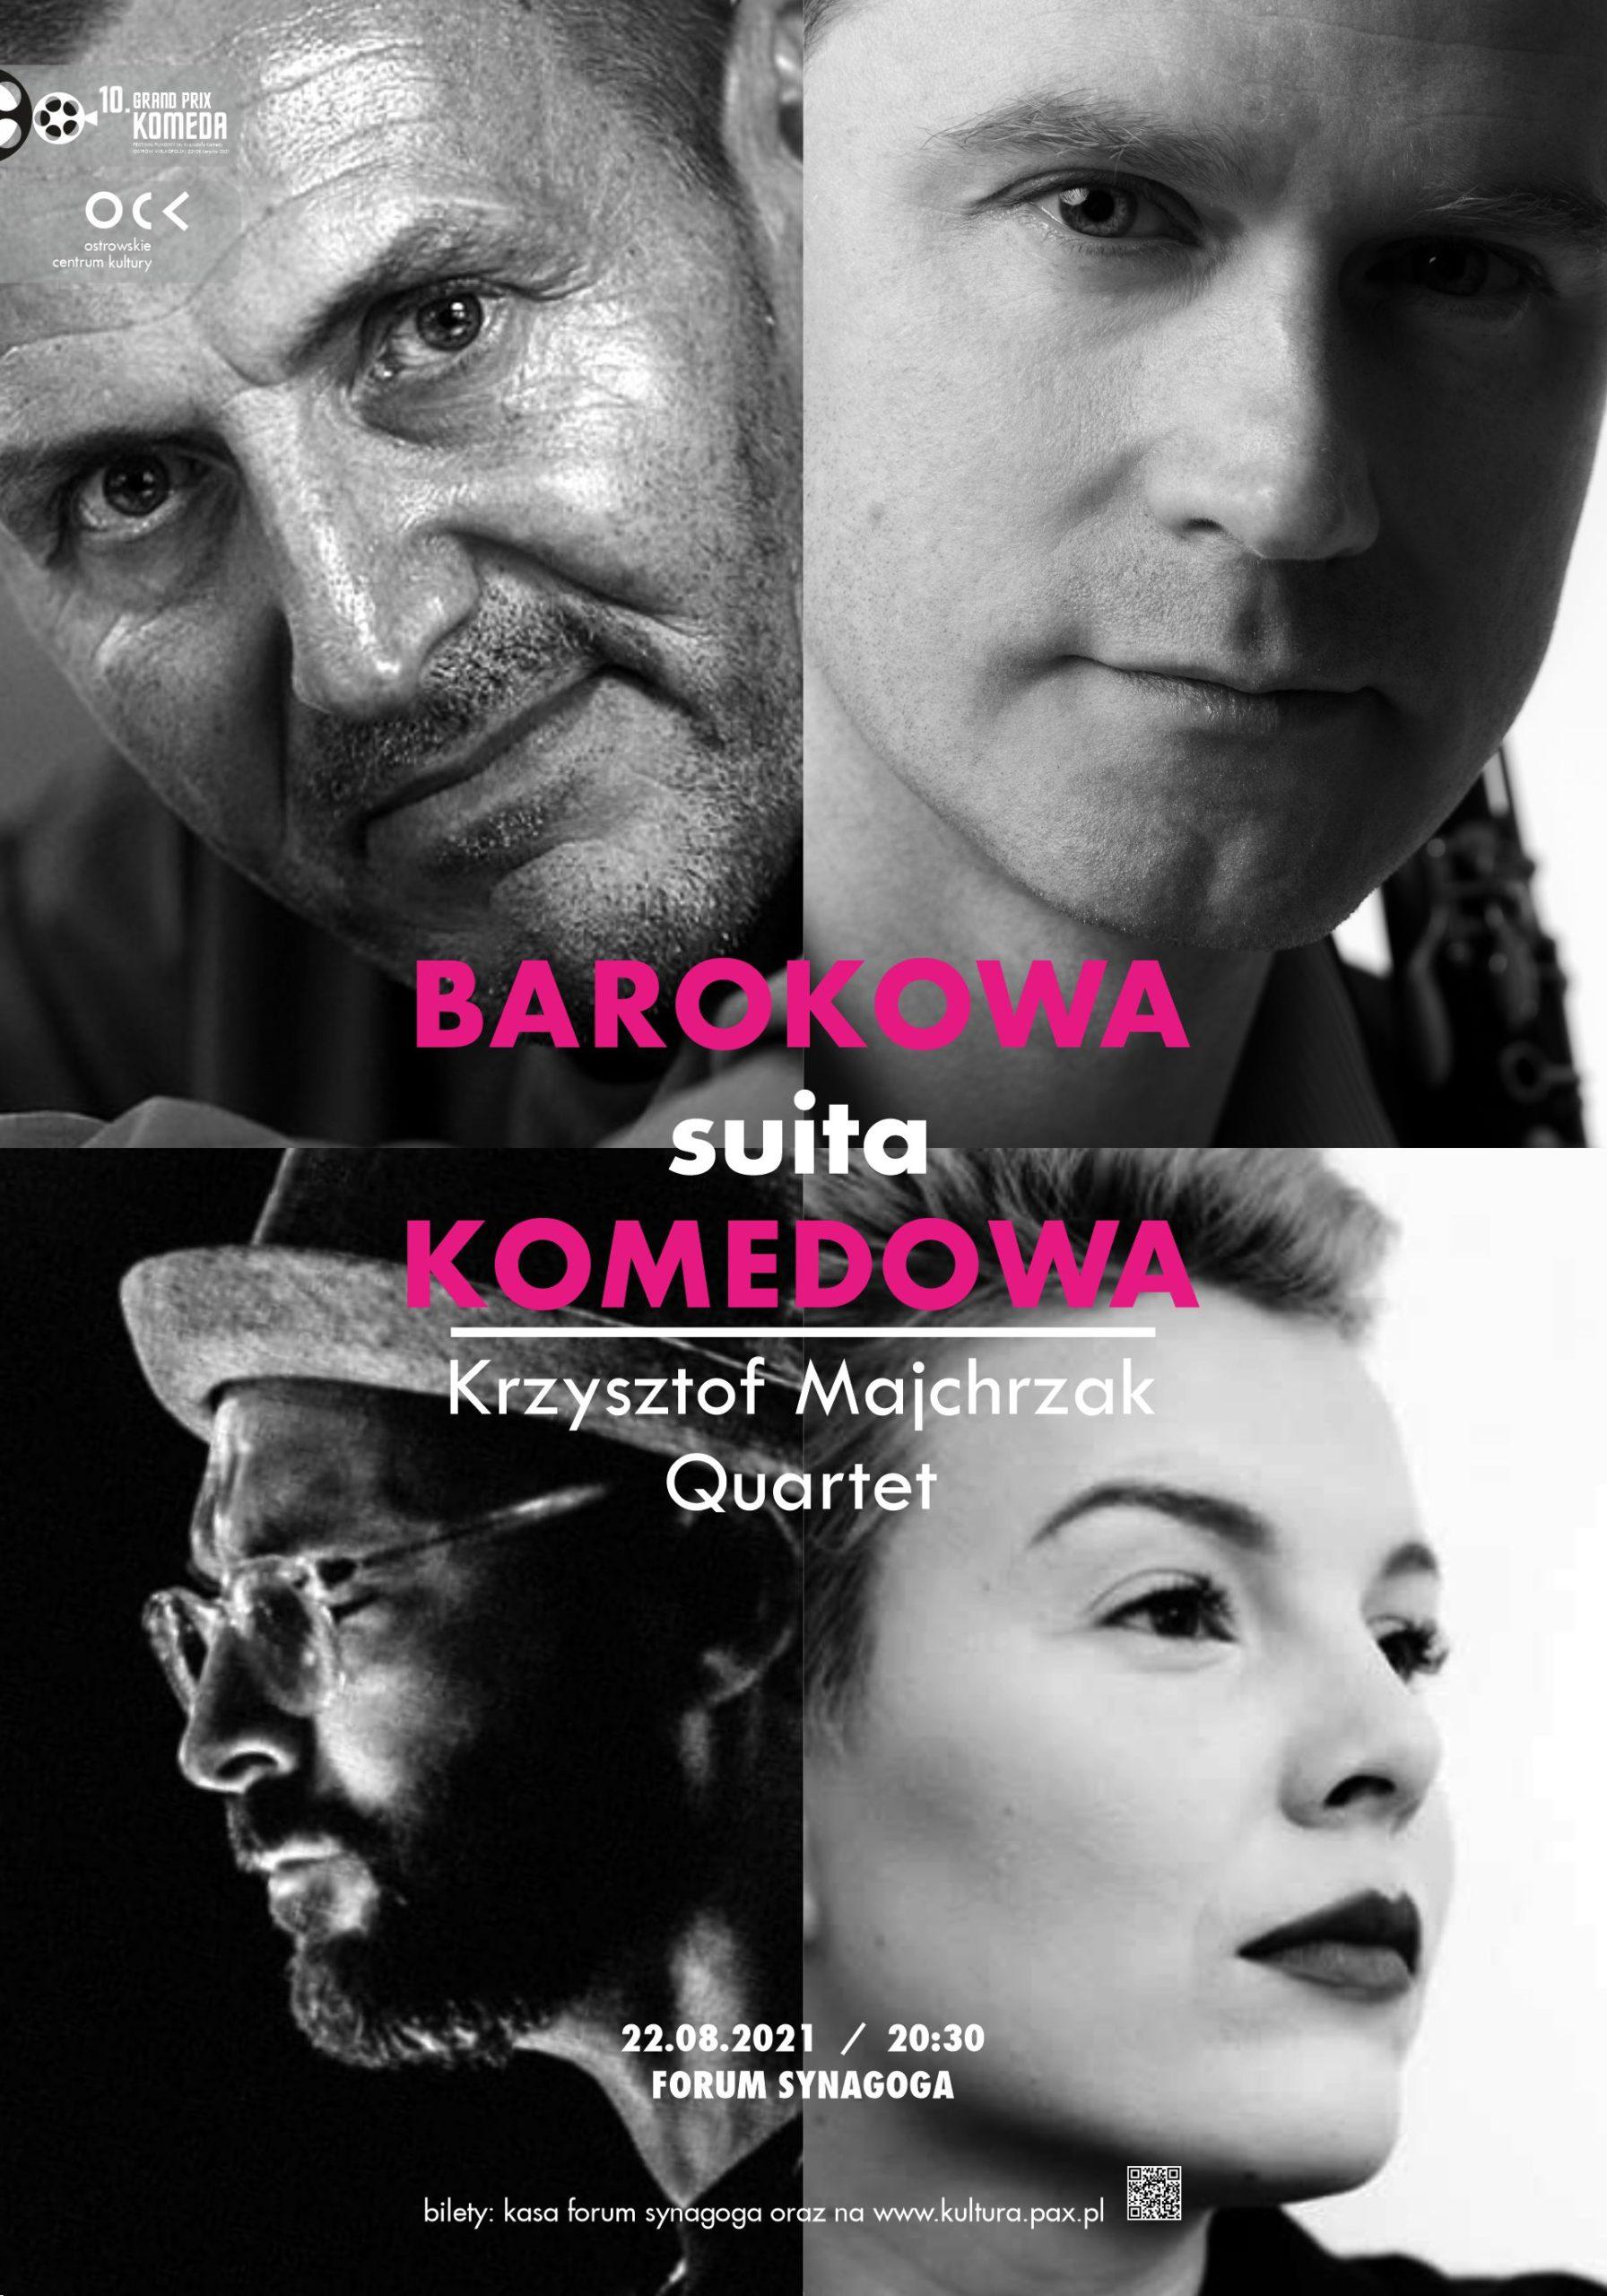 10.GPK Krzysztof Majchrzak Quartet | BAROKOWA SUITA KOMEDOWA